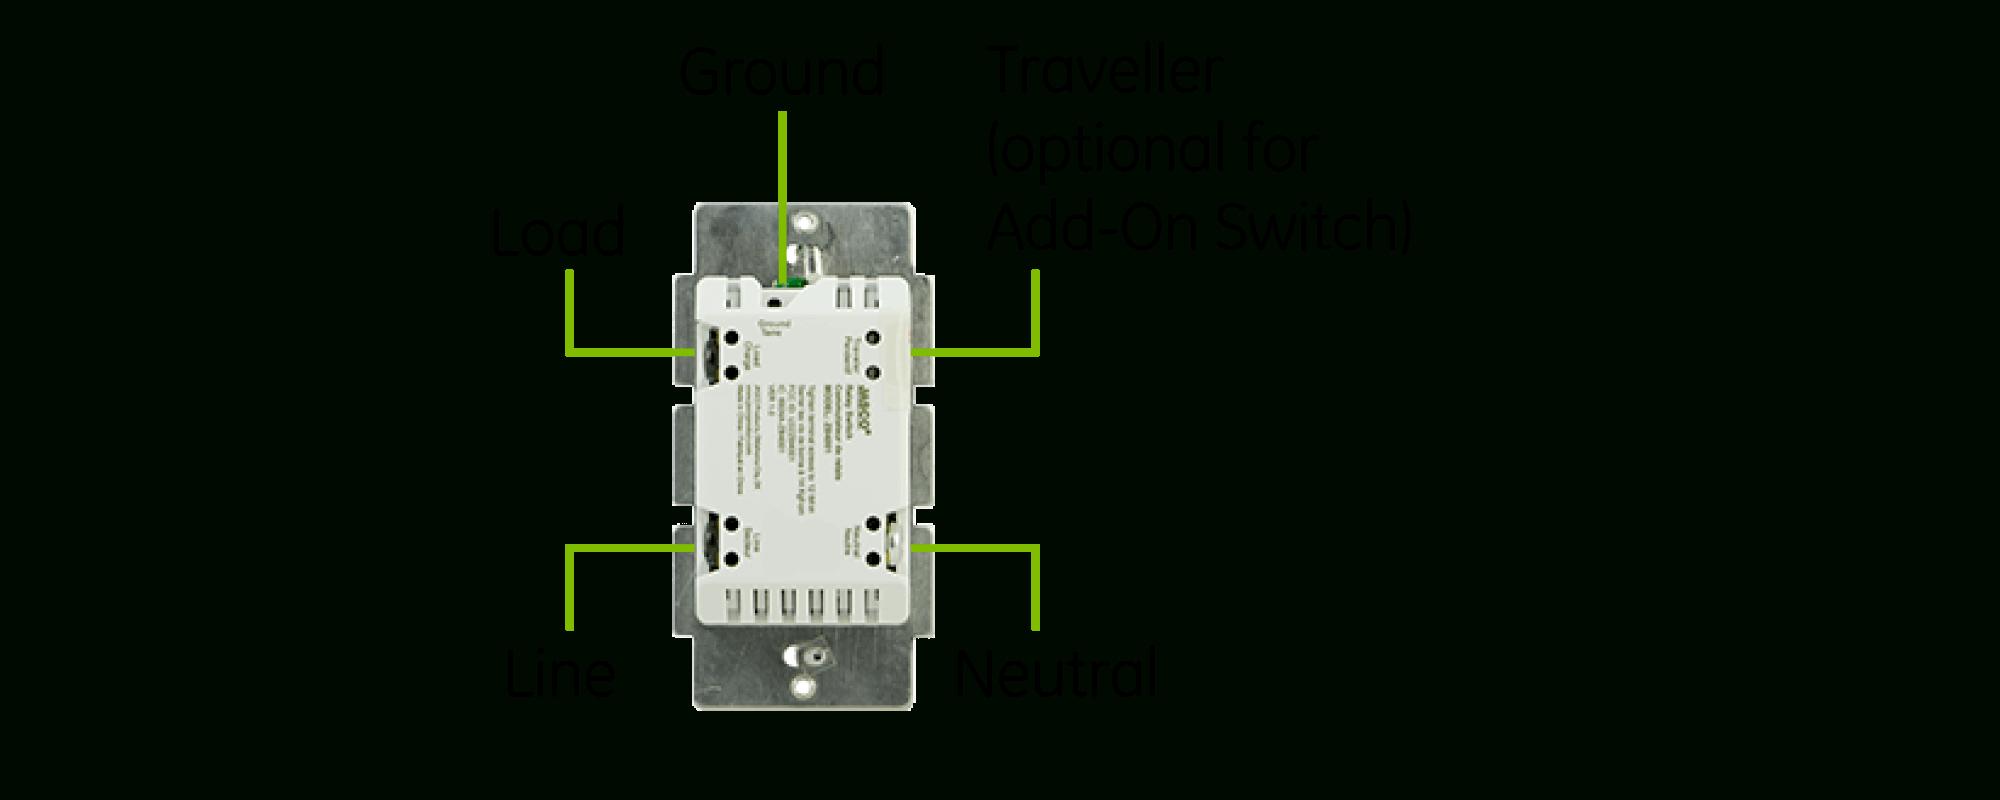 Ge Z Wave 3 Way Switch Wiring Diagram | Wiring Diagram - Ge Z Wave 3 Way Switch Wiring Diagram